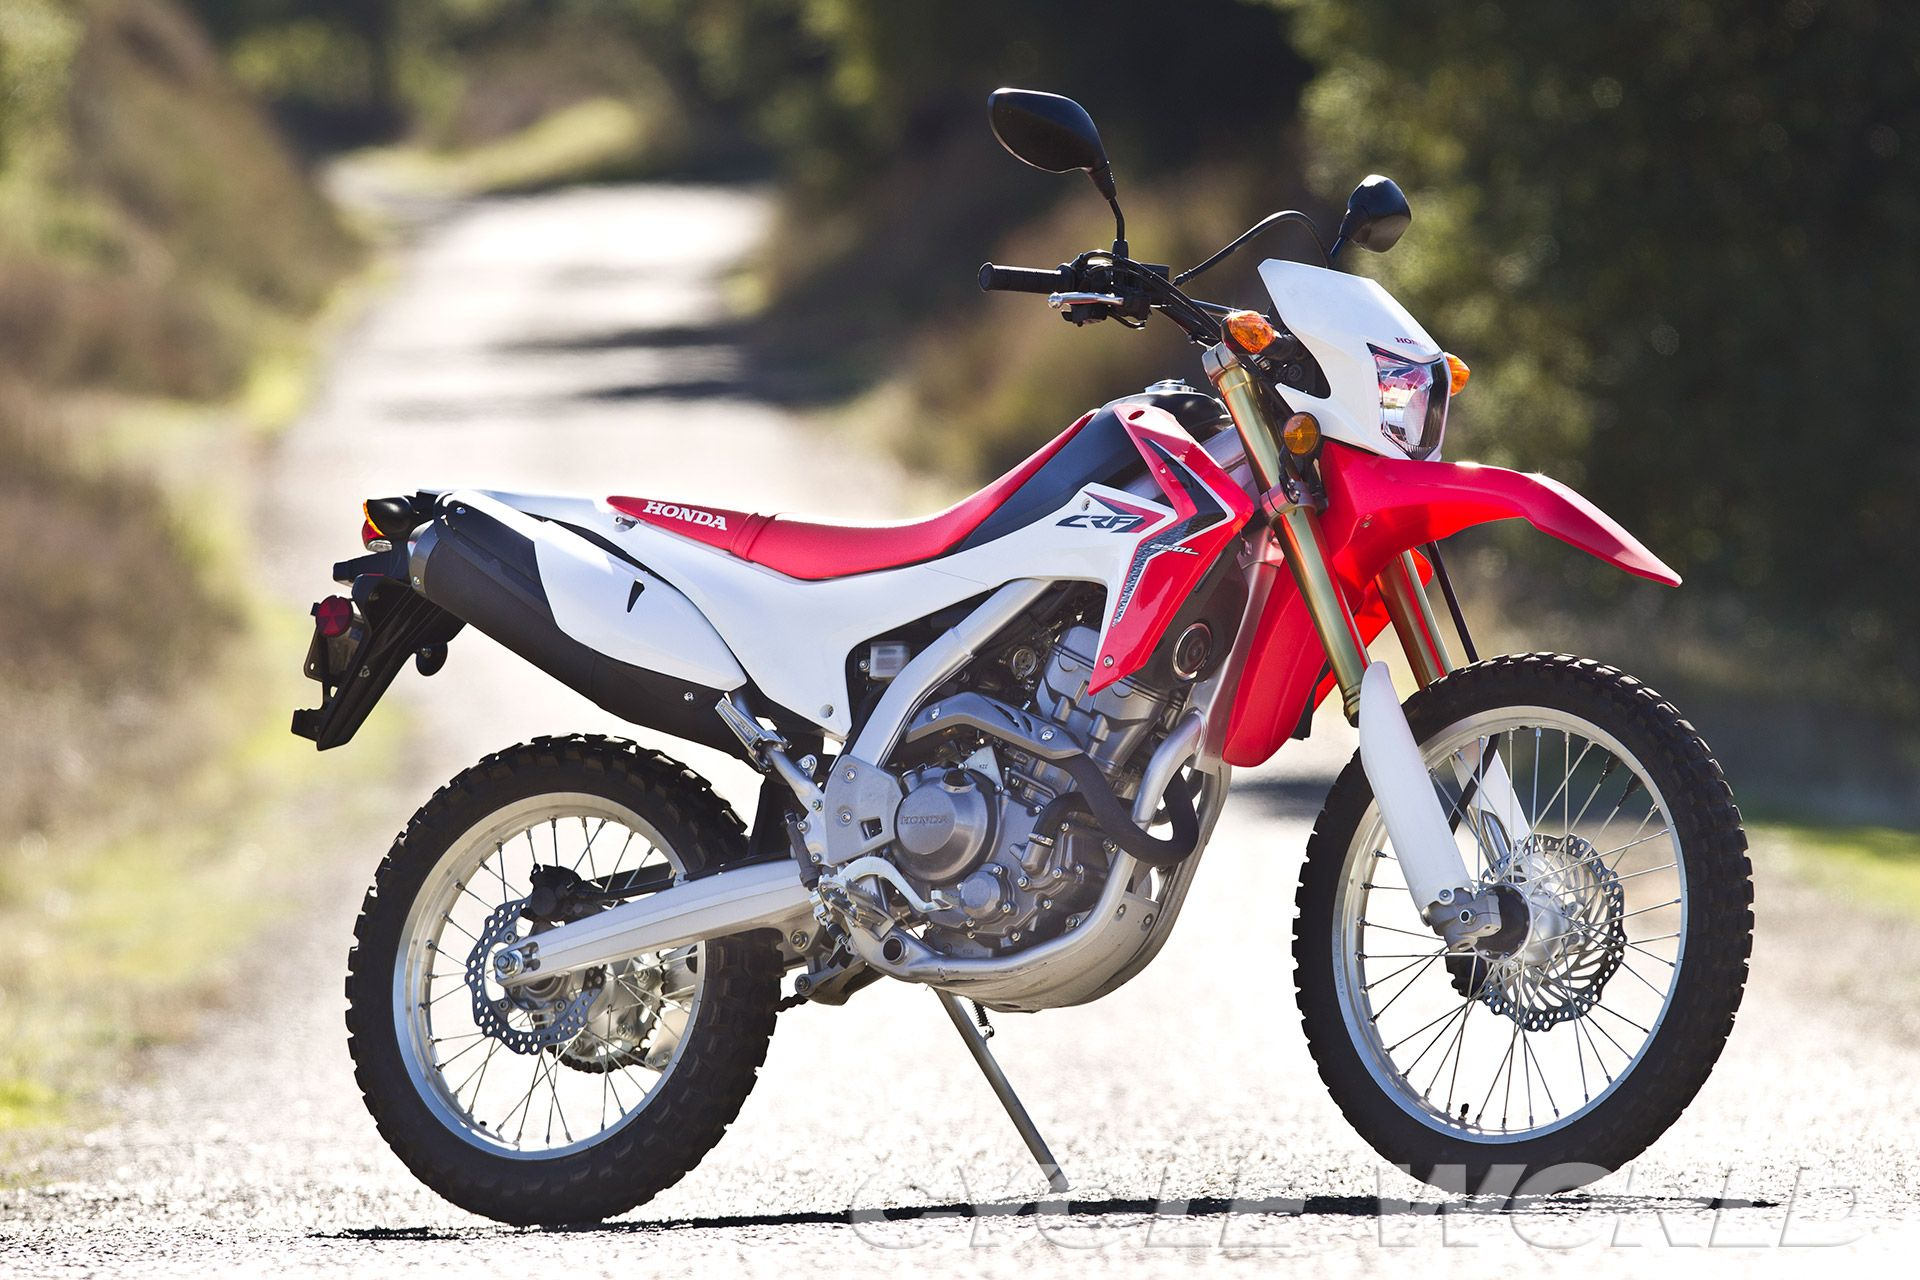 Honda crf250l 5000